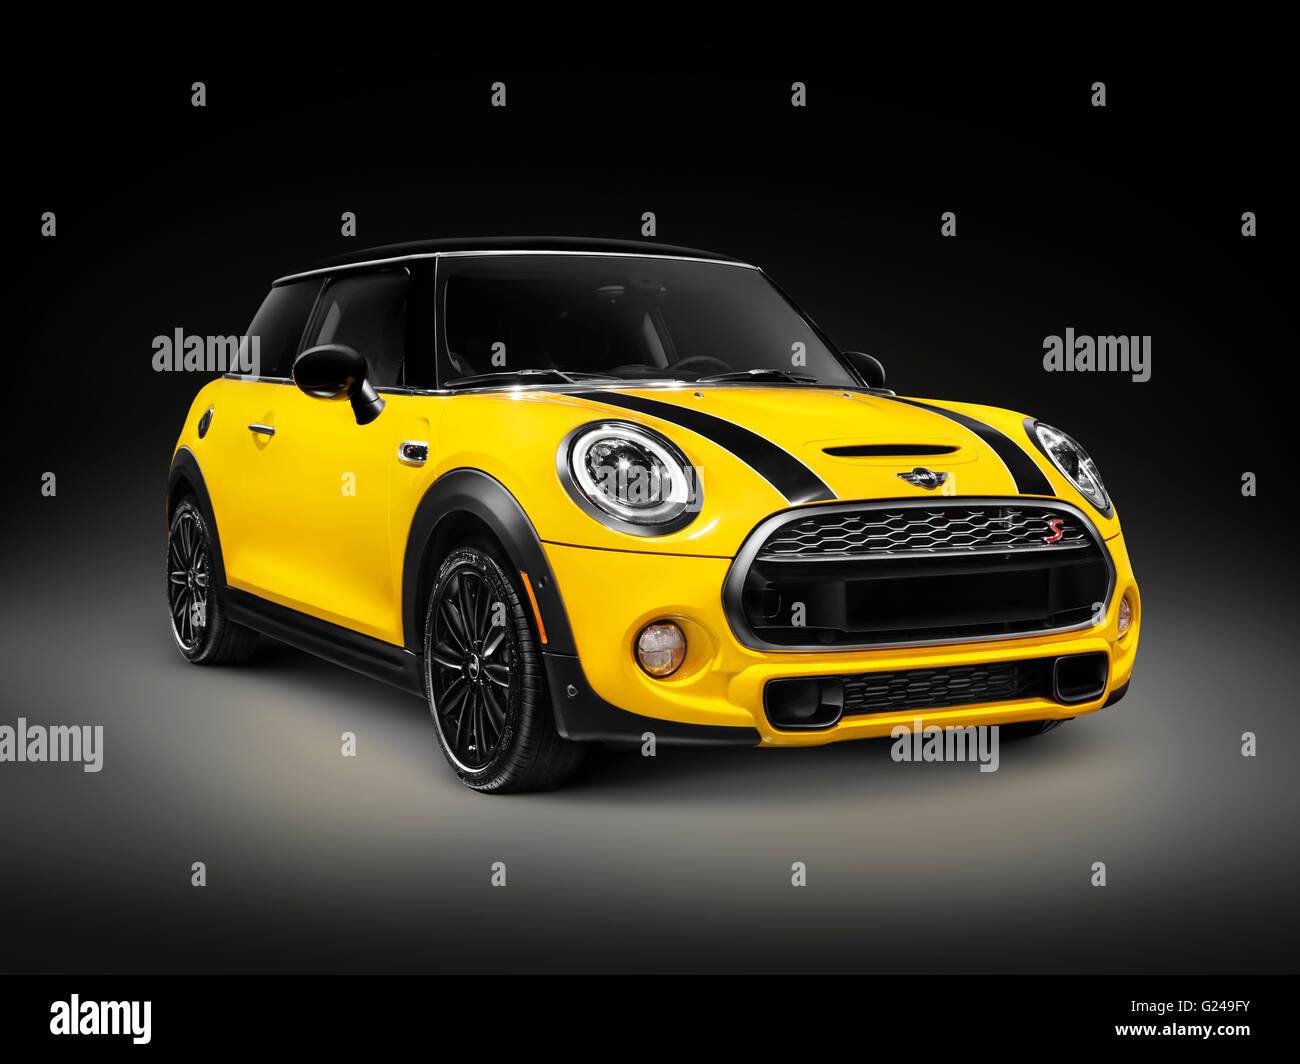 Yellow 2014 Mini Cooper S, Mini Hatch, hatchback compact city car - Stock Image